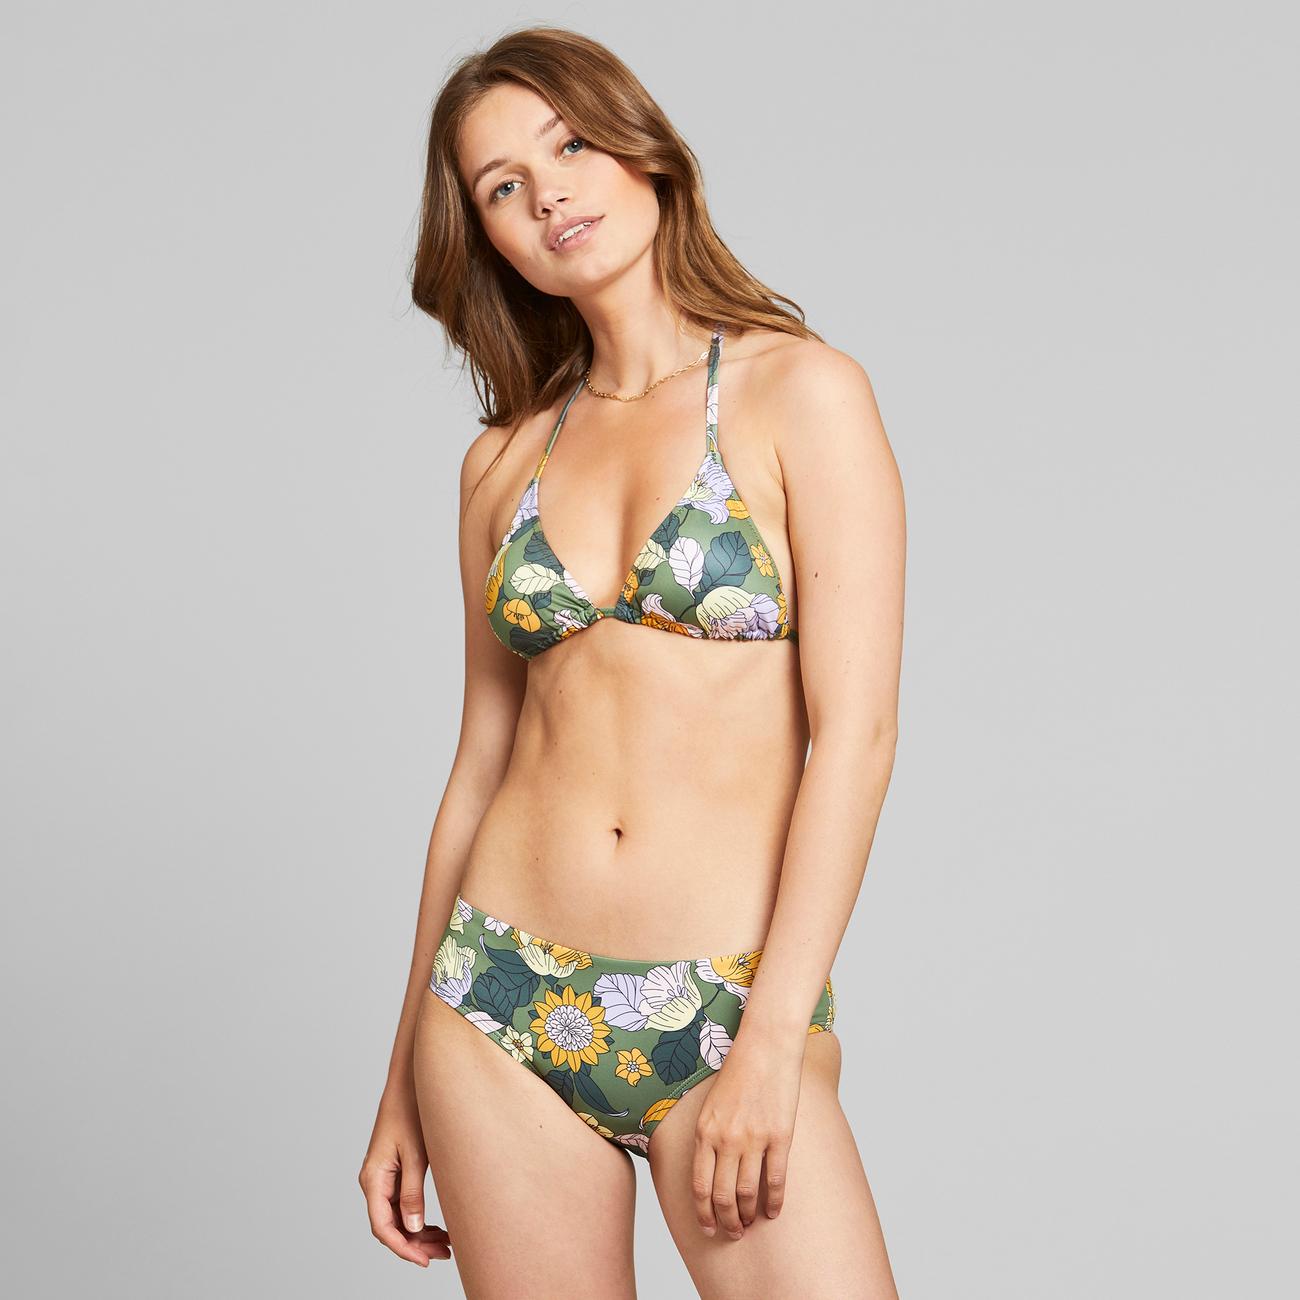 Bikini Top Sandnes Seventies Floral Green